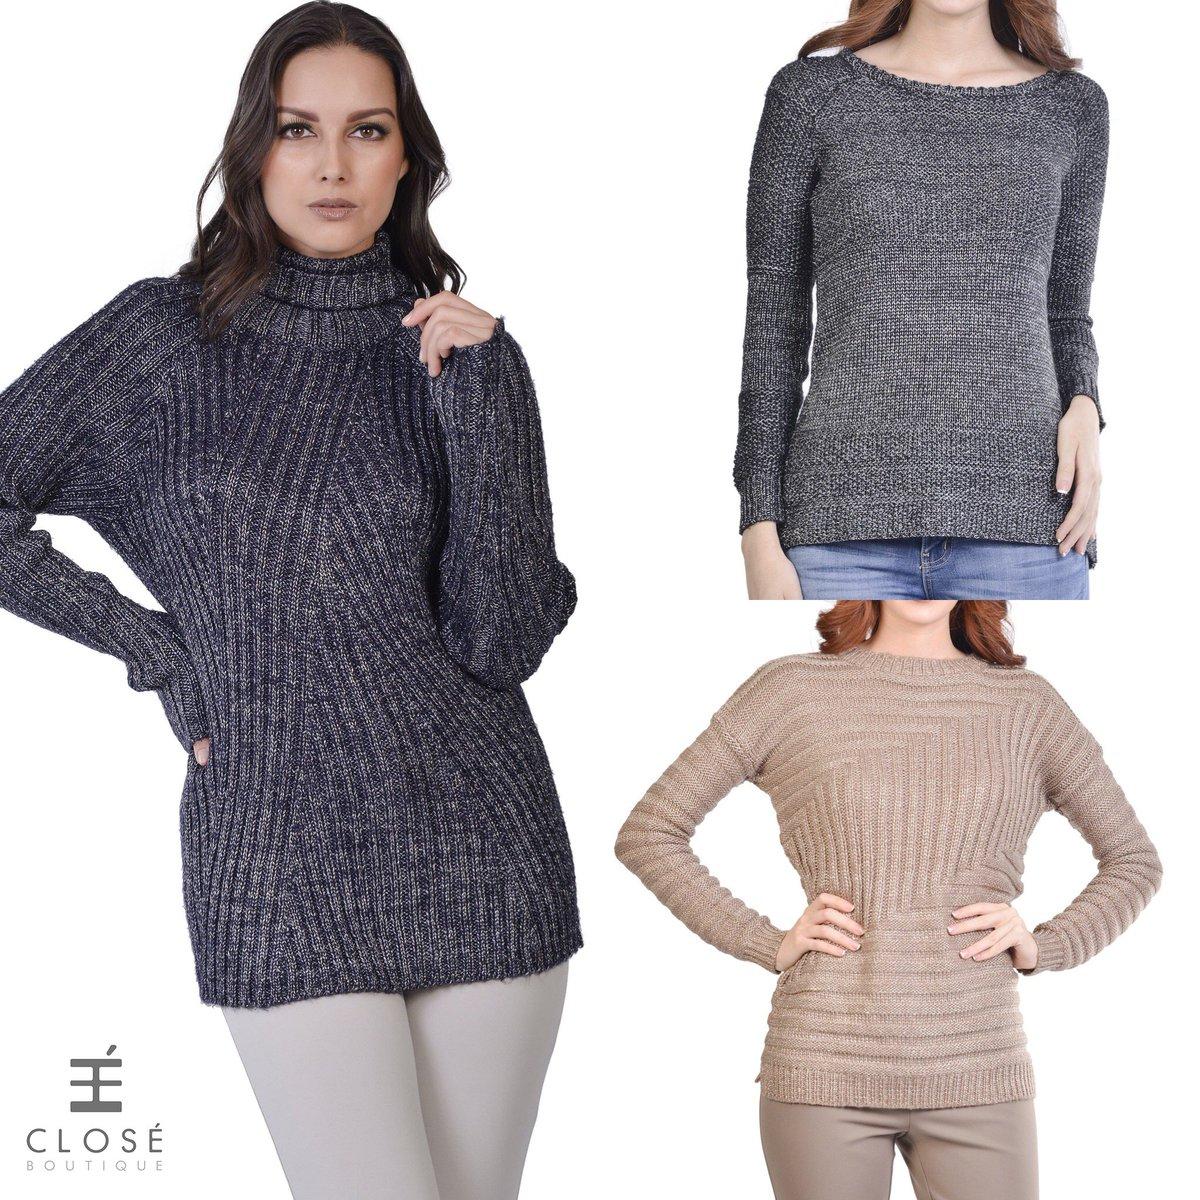 Encuentra el #suéter perfecto para ti. Descubre más estilos en: https://t.co/m20dfnu0zw #dressinstyle #seenowbuynow https://t.co/4C0mPuSCvv